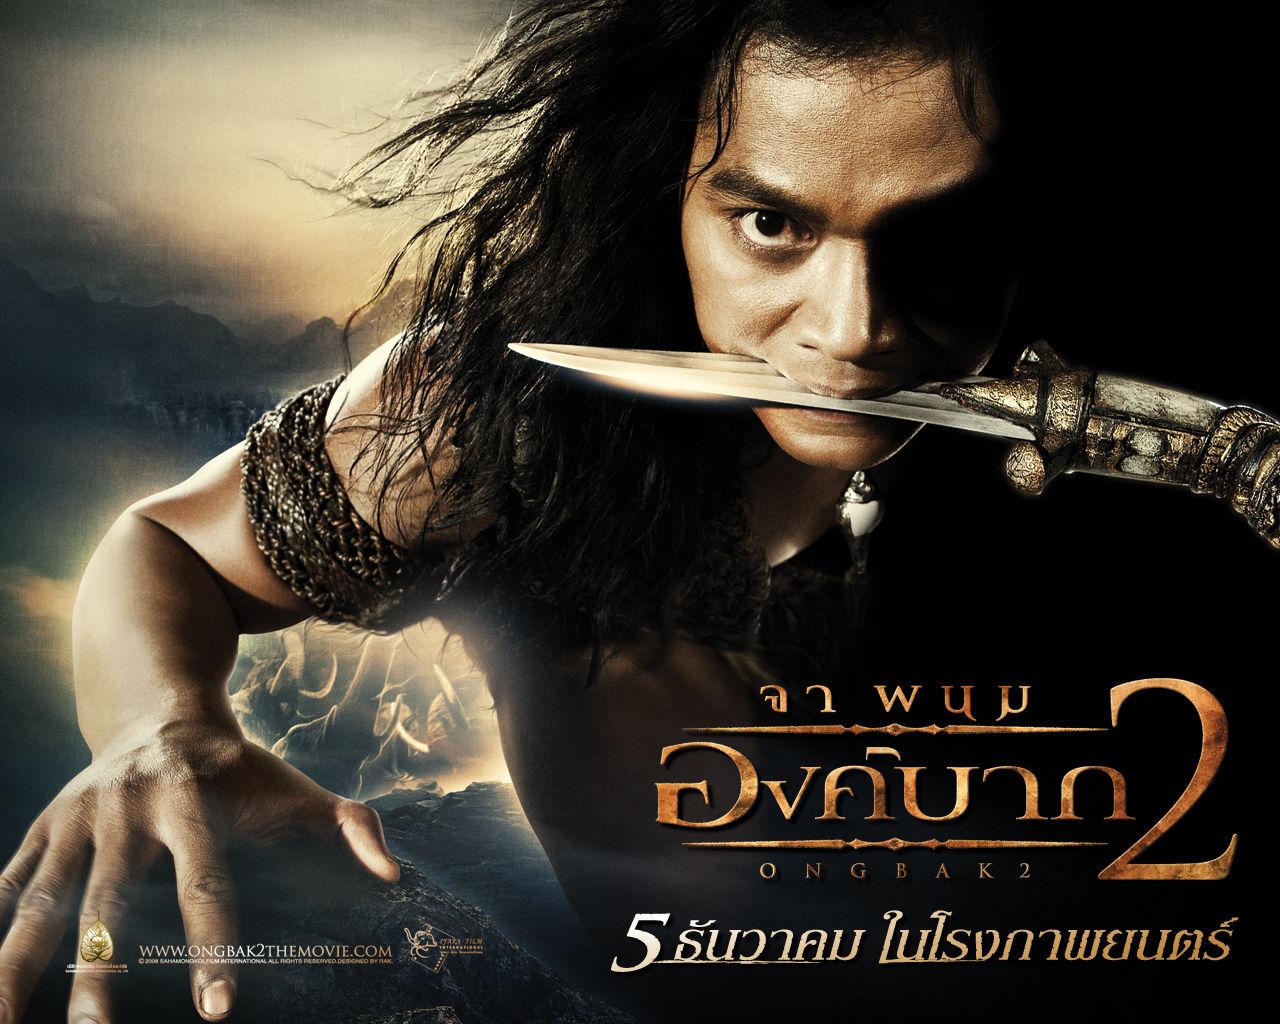 Ong-Bak Pics, Movie Collection